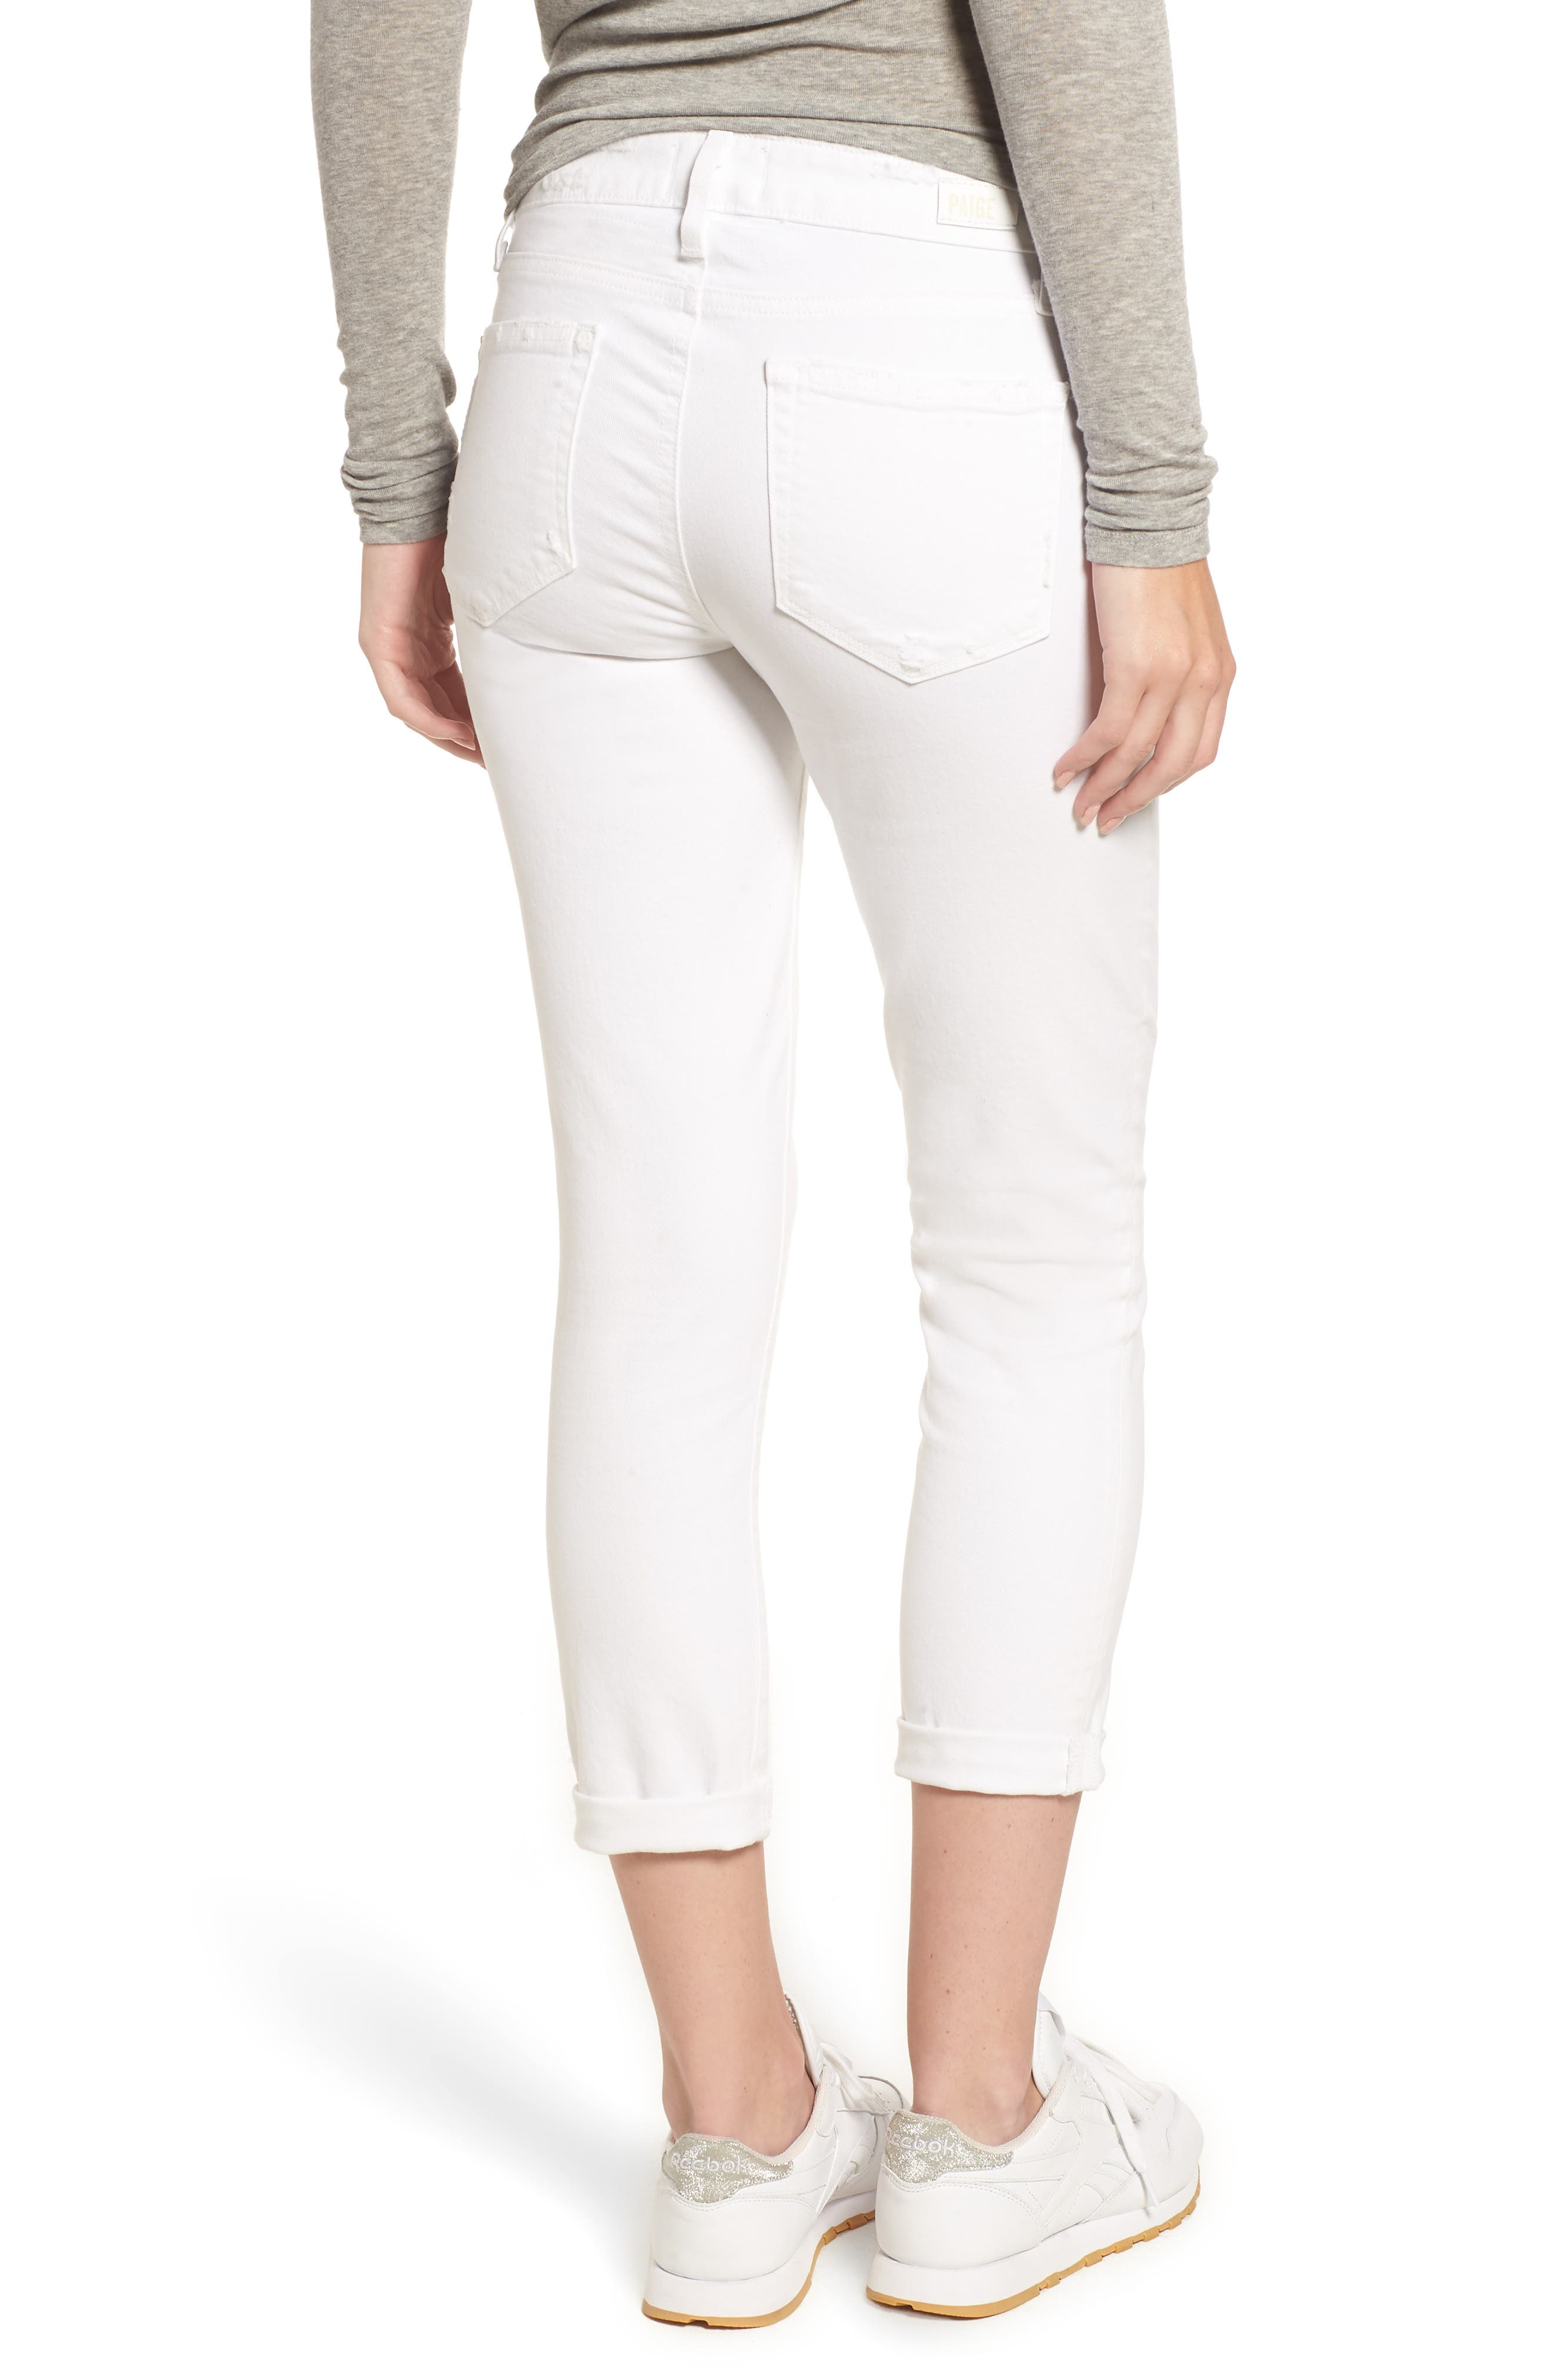 PAIGE, Skyline Raw Hem Crop Skinny Jeans, Alternate thumbnail 2, color, LIVED IN CRISP WHITE